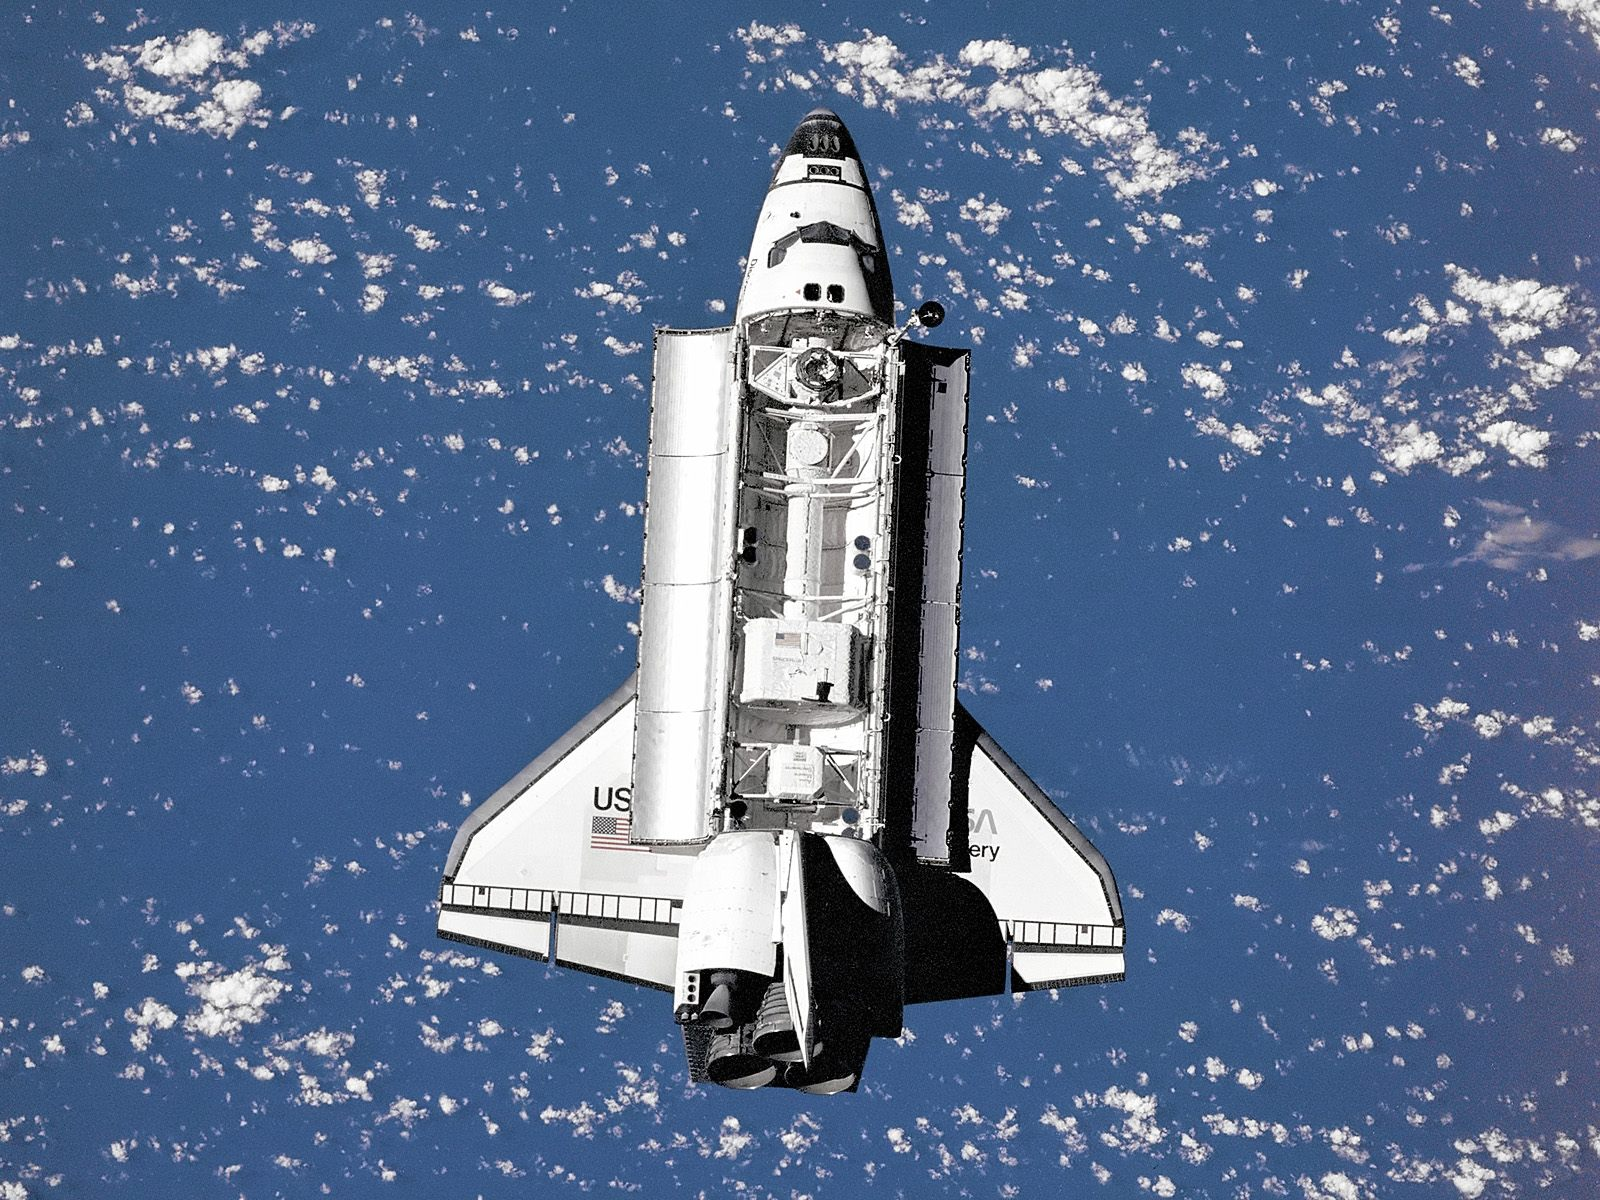 space shuttle fleet names - photo #39